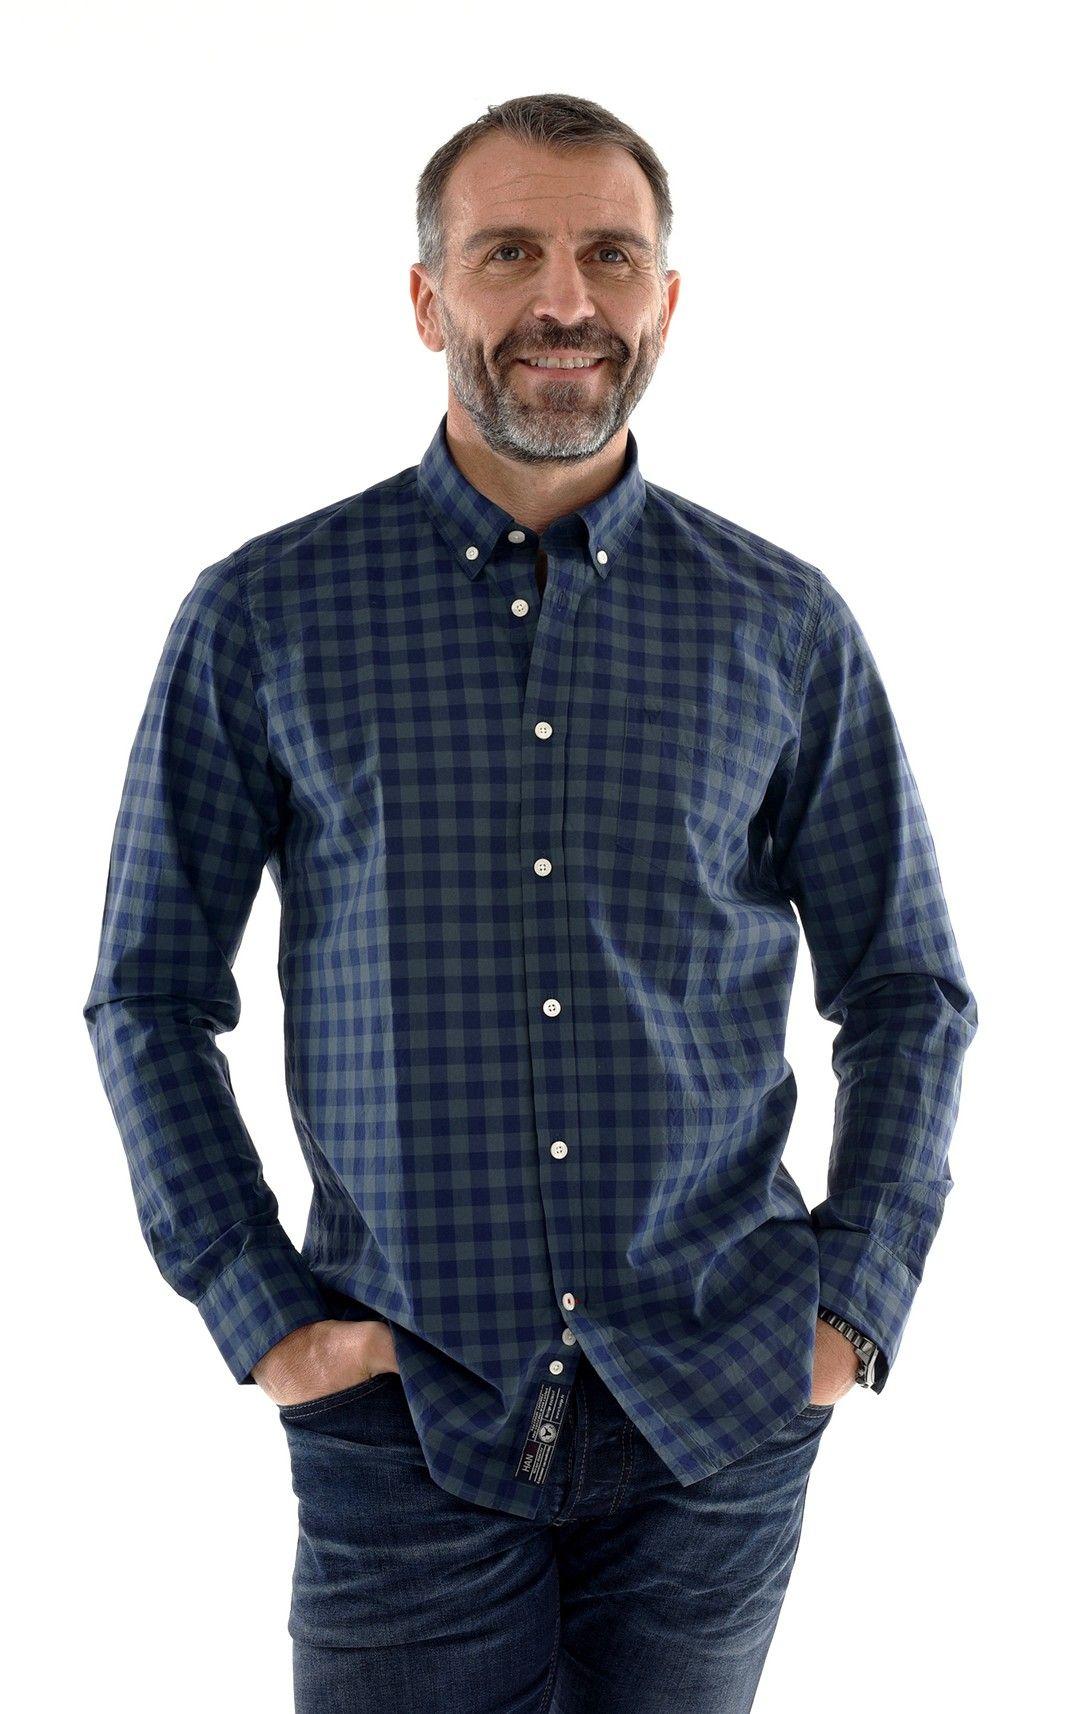 tenue homme classe soir e fete style moderne habill chemise carreaux marine vert mode homme. Black Bedroom Furniture Sets. Home Design Ideas